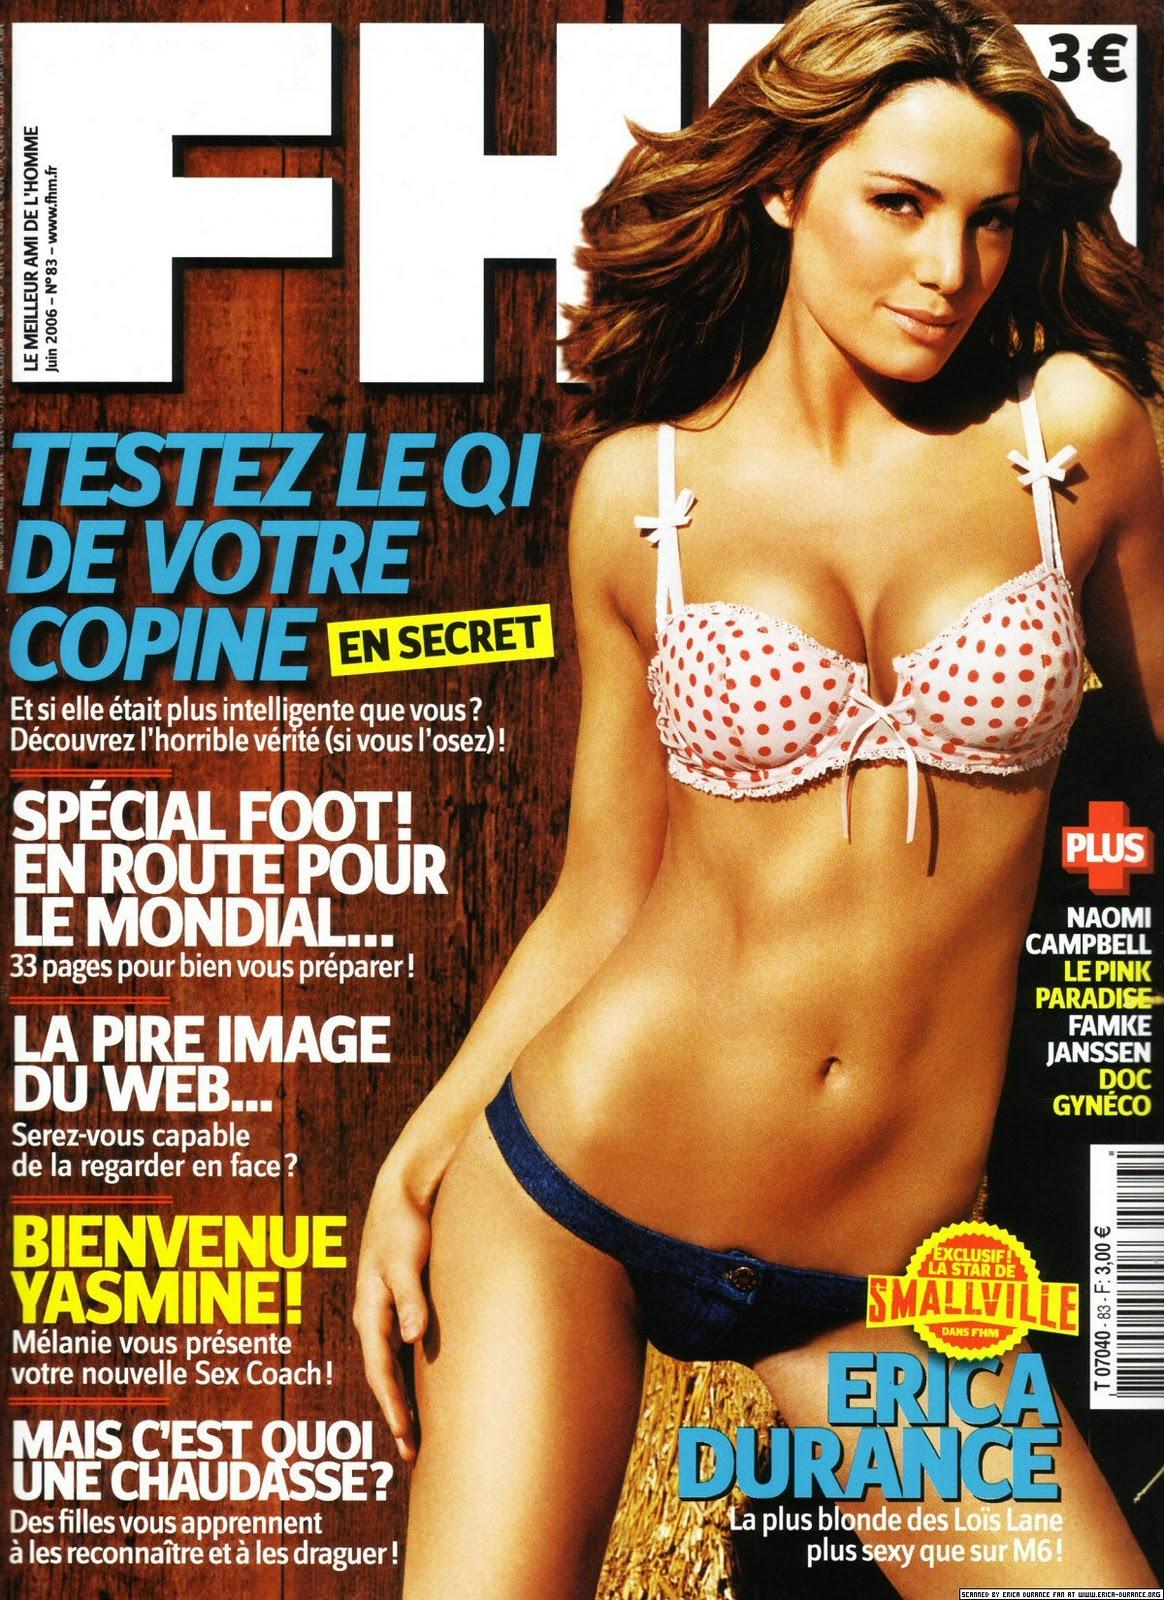 http://2.bp.blogspot.com/_QcYf_8sBCik/TMzy7igSIuI/AAAAAAAAHa4/ZuW-D0wy9-U/s1600/Erica+Durance+FHM+France+June+2006.jpg